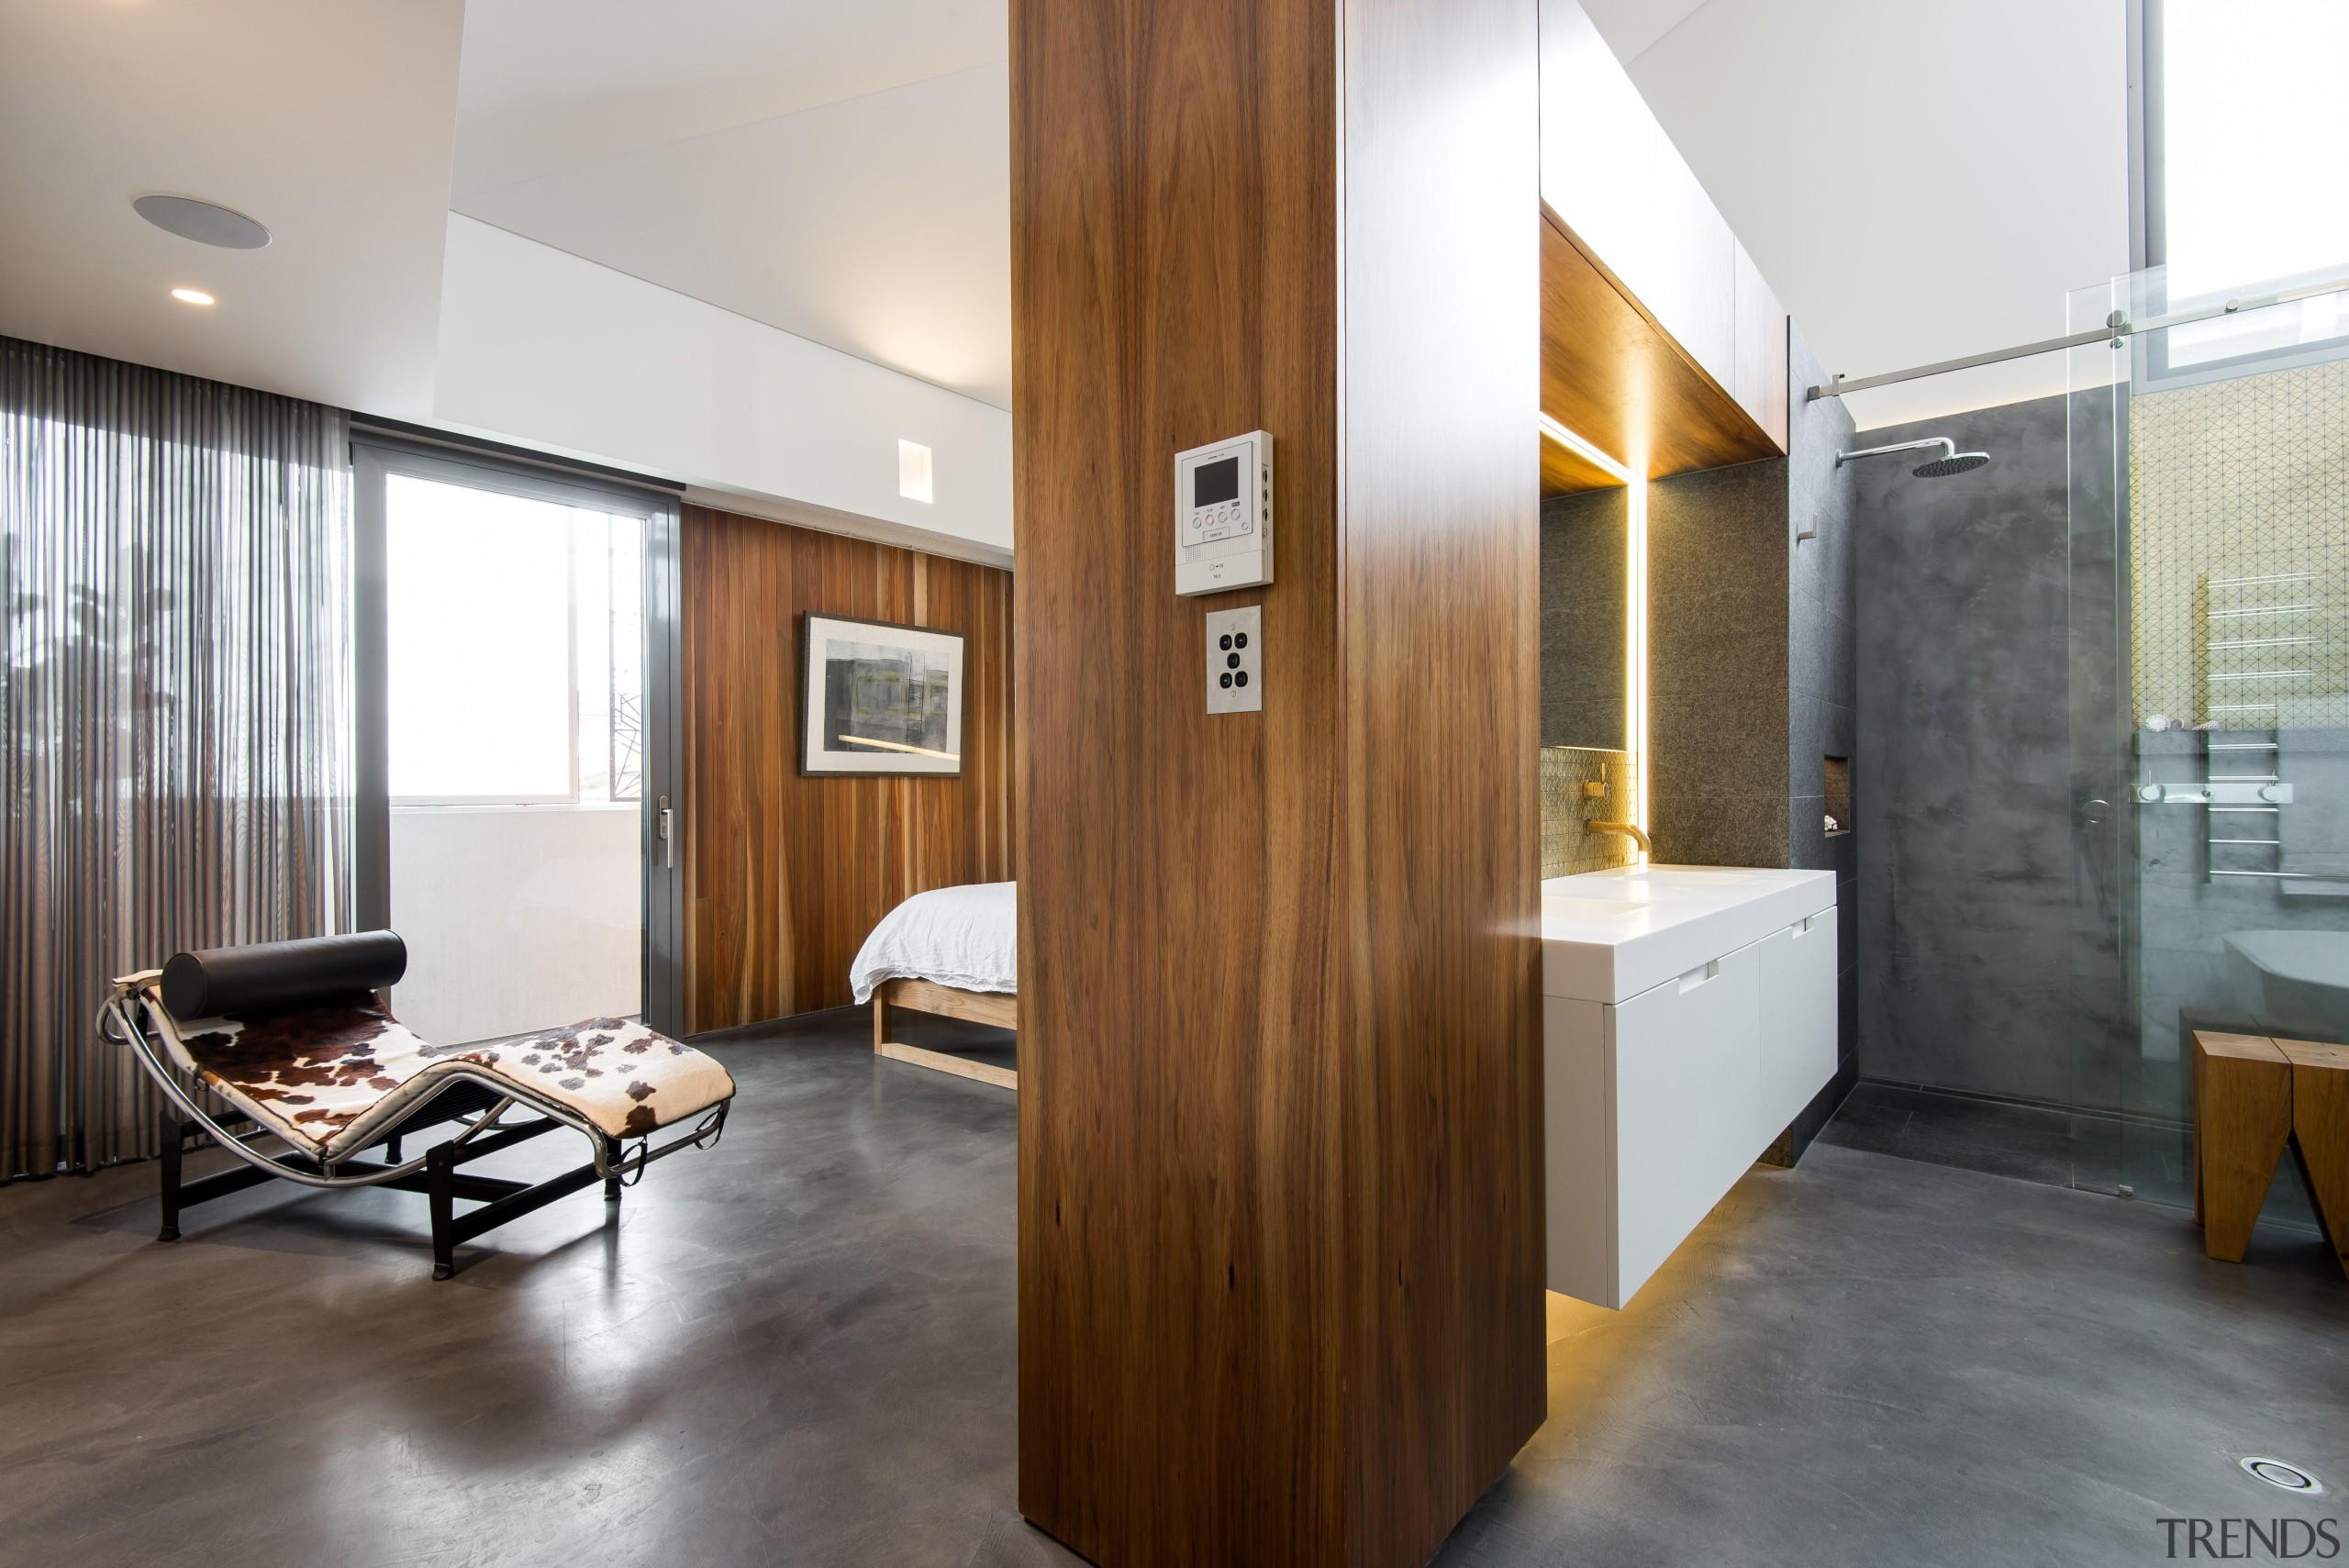 Joe Chindarsi of Chindarsi Architects - Winner of architecture, ceiling, floor, flooring, interior design, real estate, white, brown